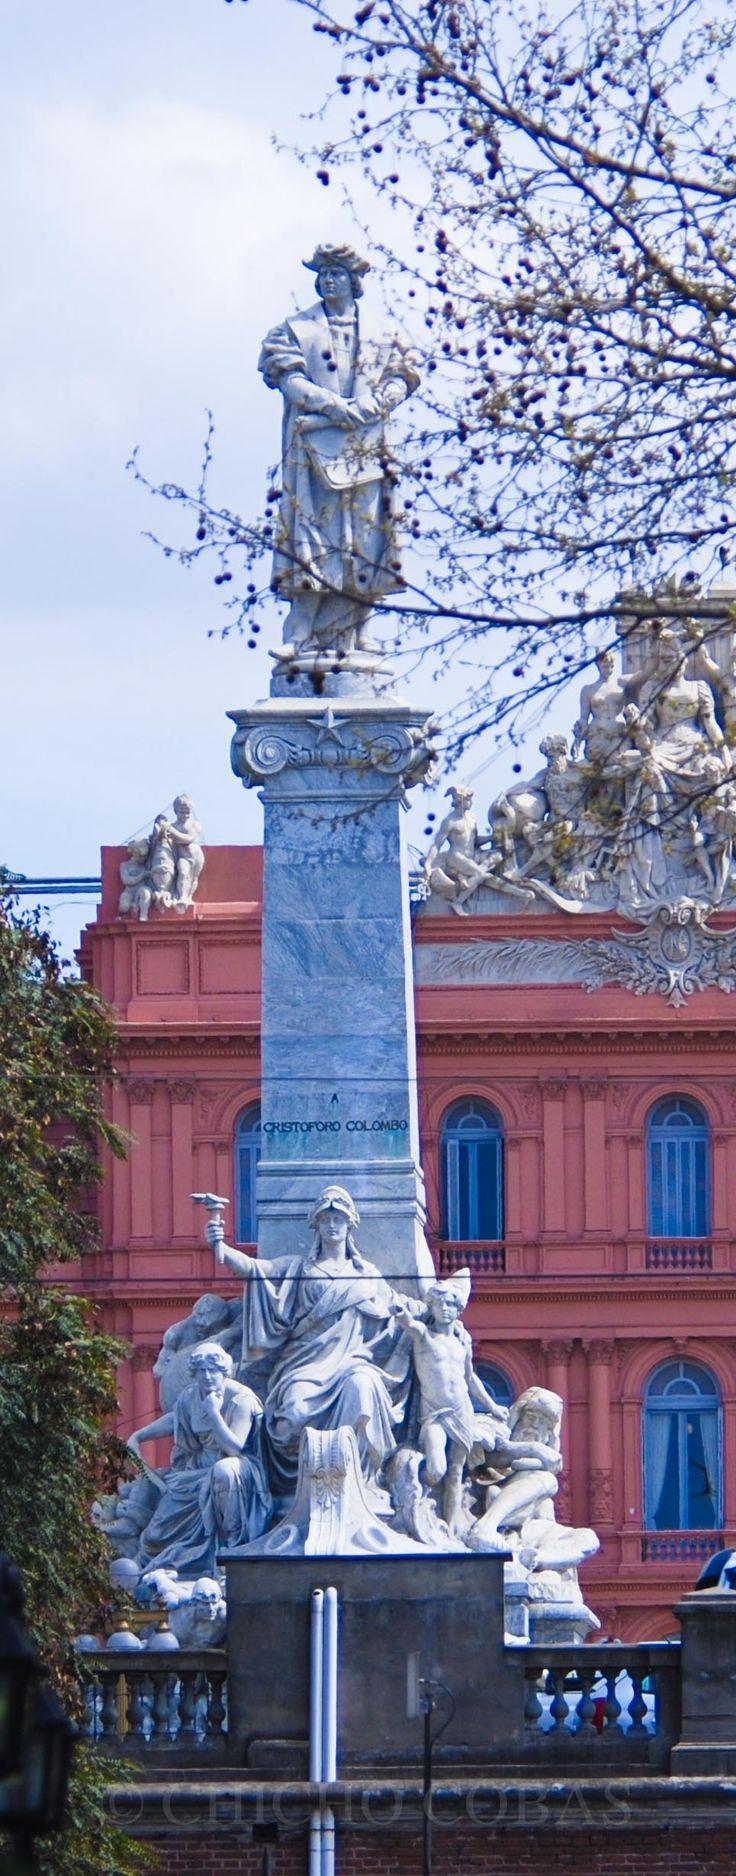 Monumento a Cristobal  Colon - Casa Rosada  al  fondo  Plaza  de Mayo -  BUENOS  AIRES